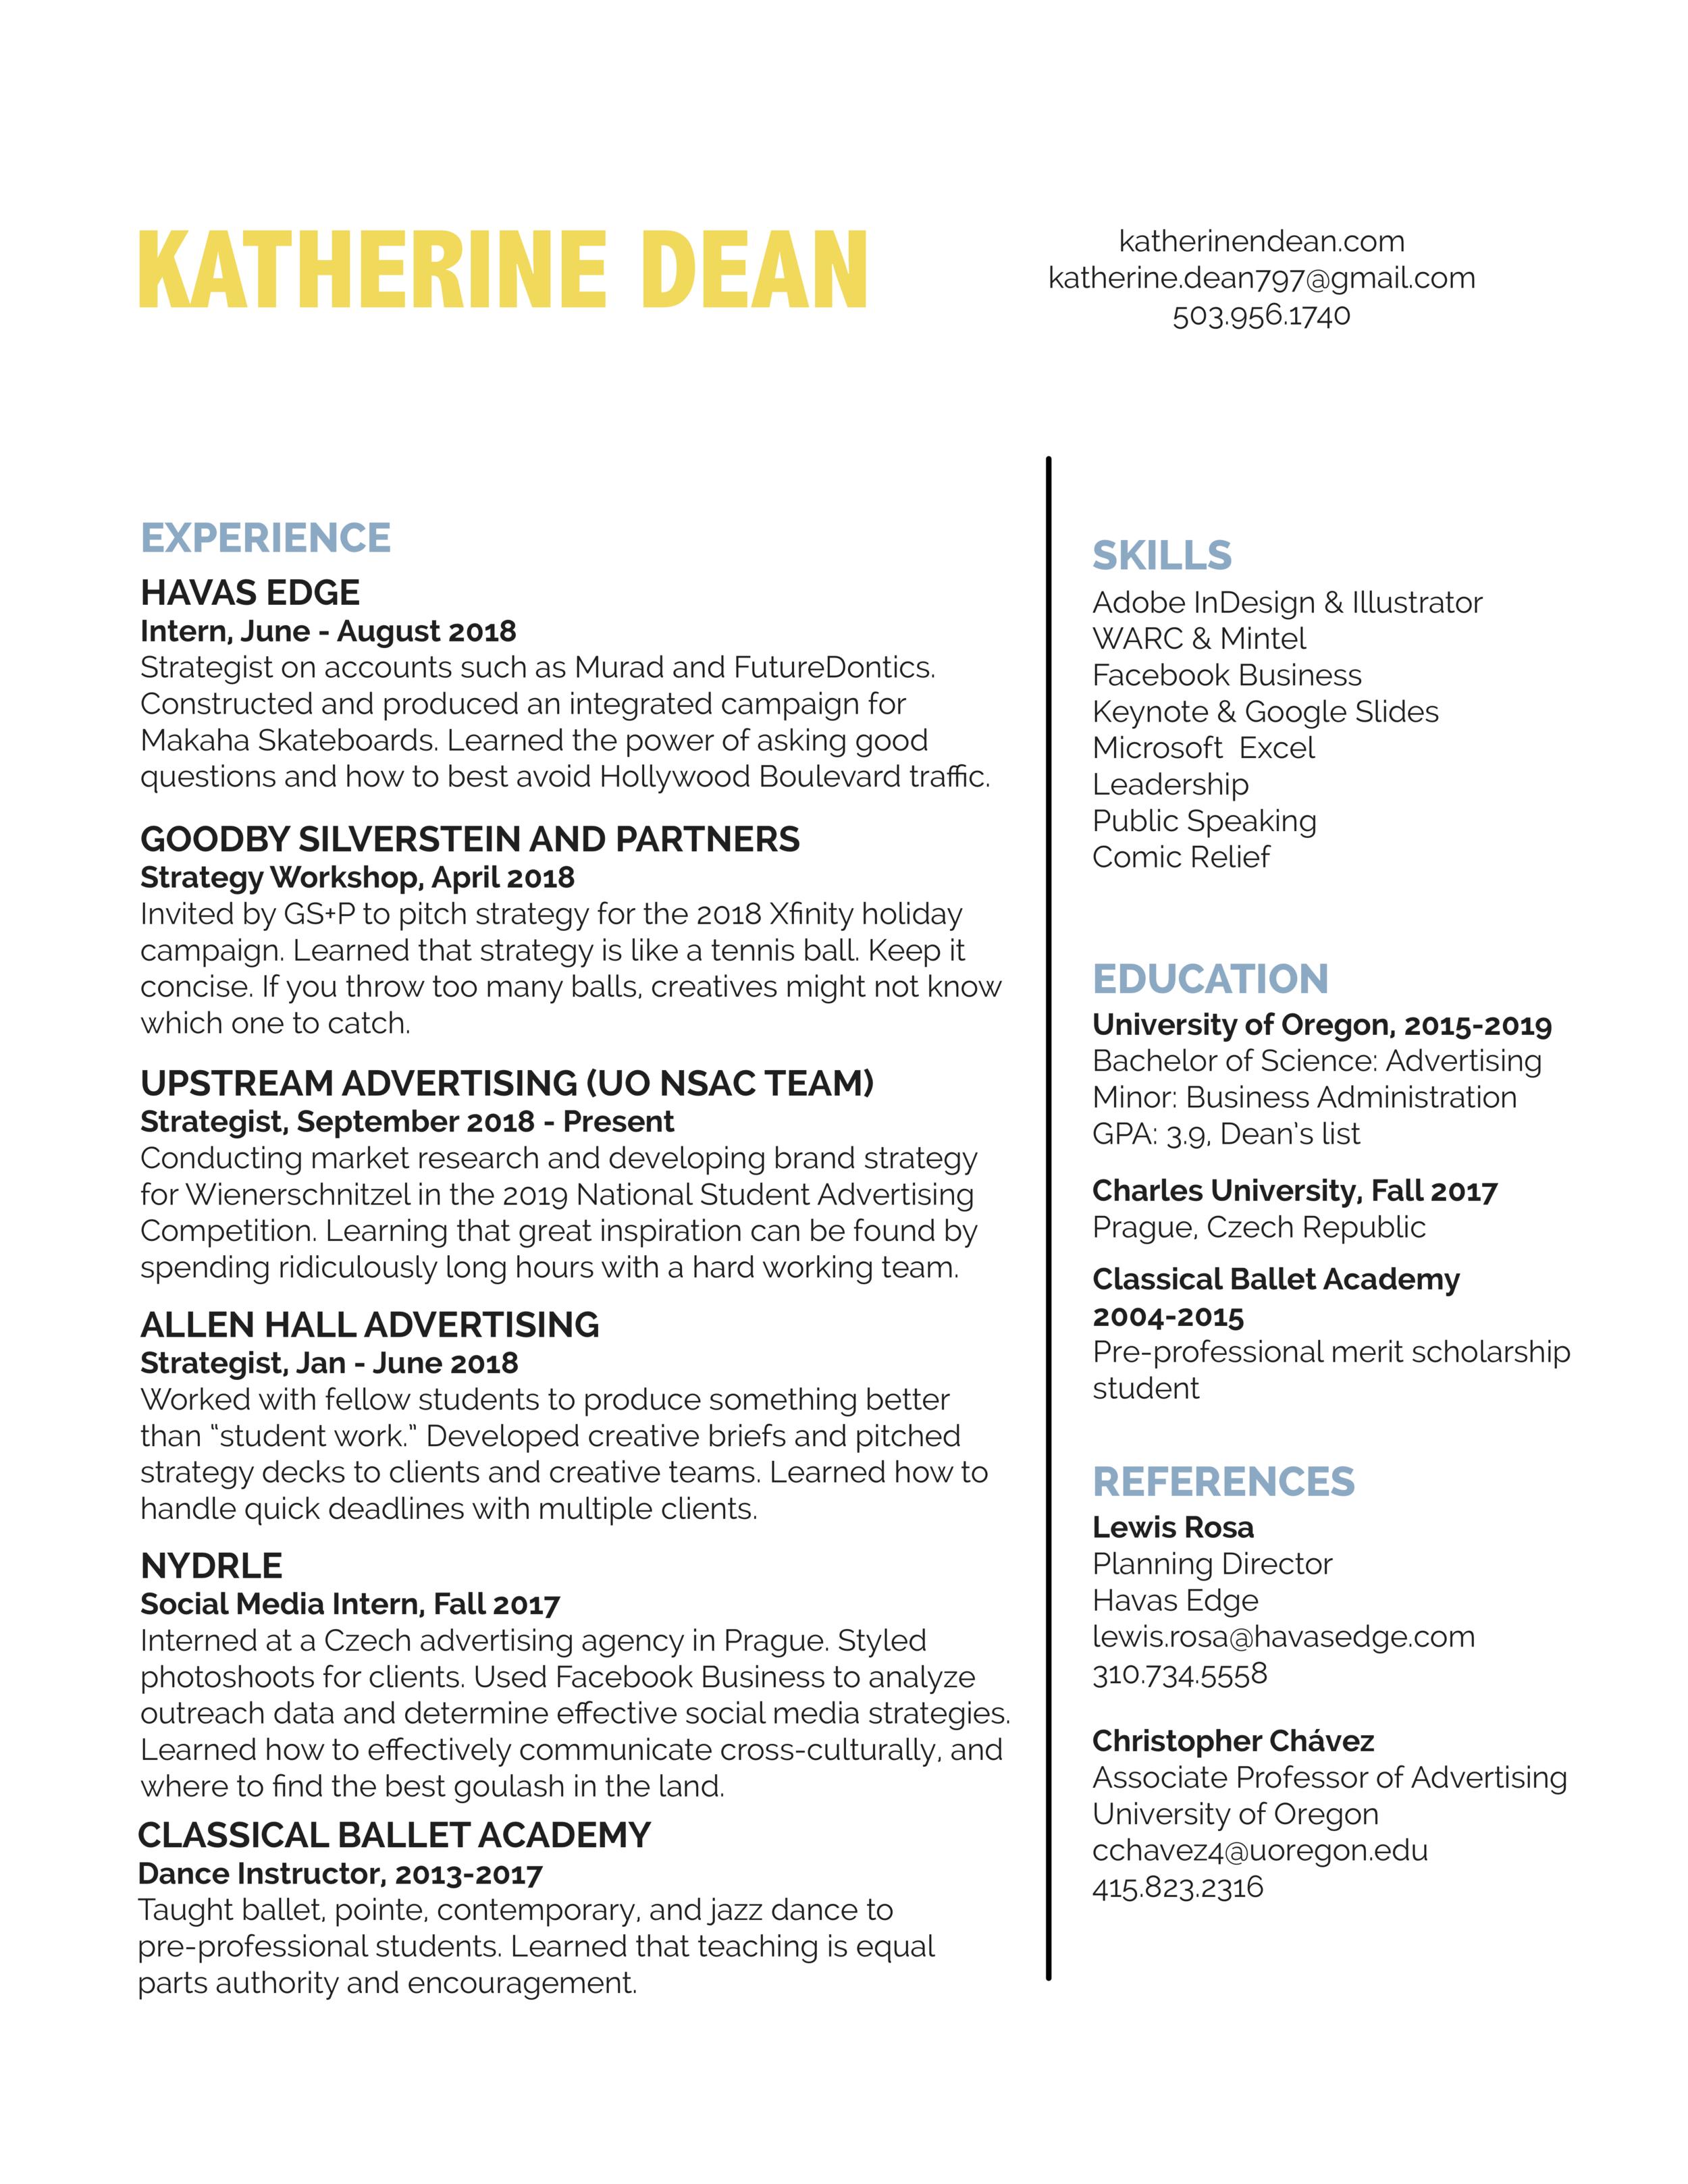 Resume Feb 2019.png